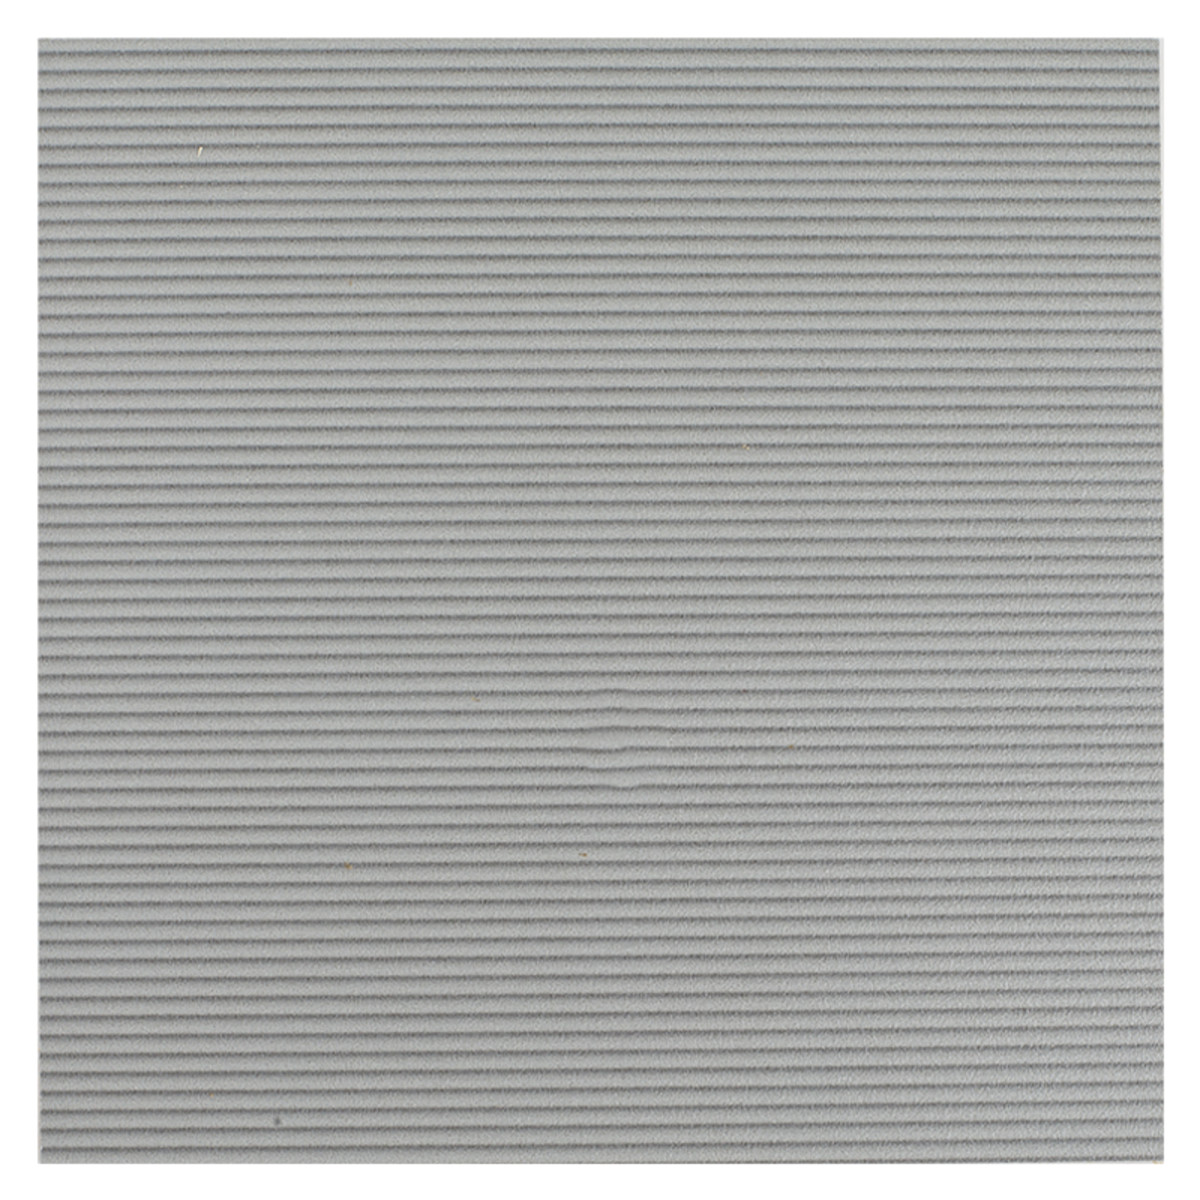 Стеновая панель №142а 305х0.8х60 см ЛДСП цвет алюминиевая рябь